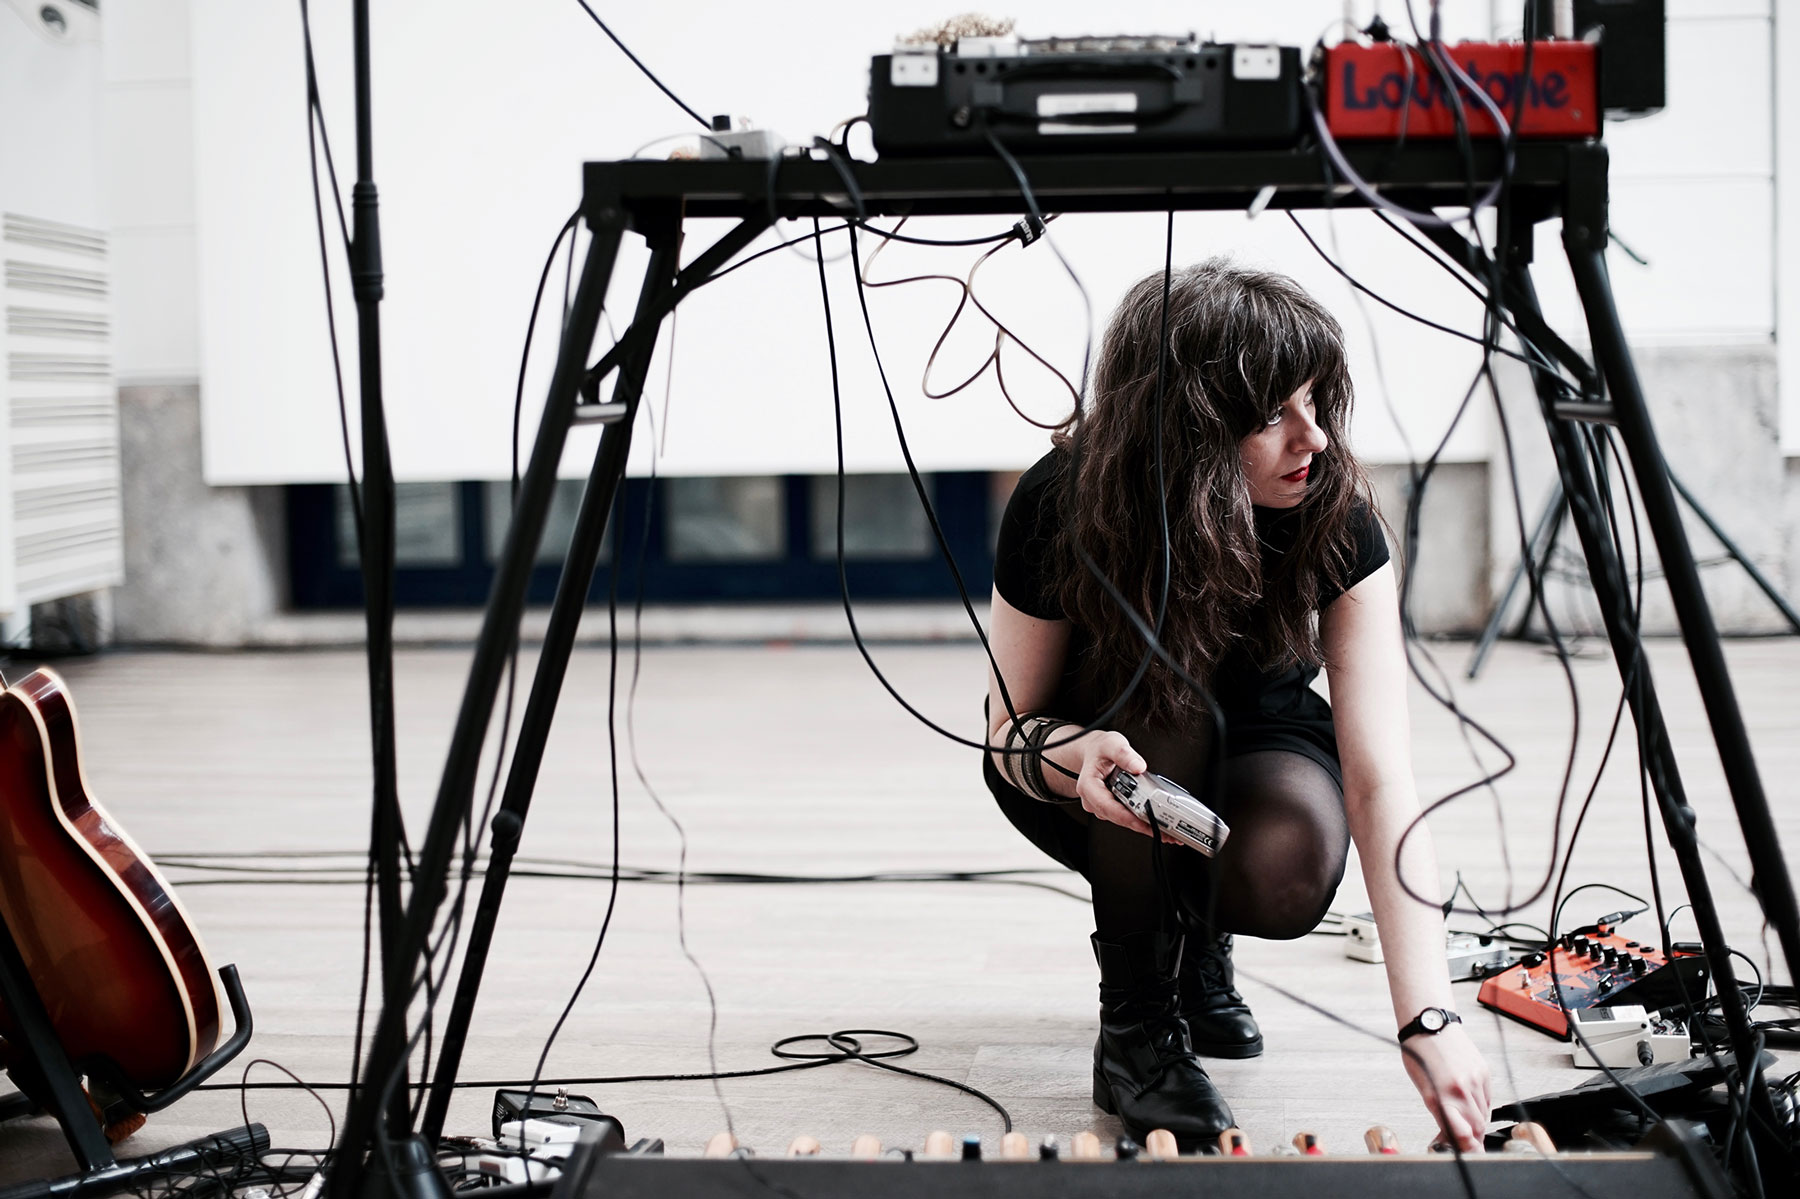 Ainara LeGardon, by Rafa Rodrigo